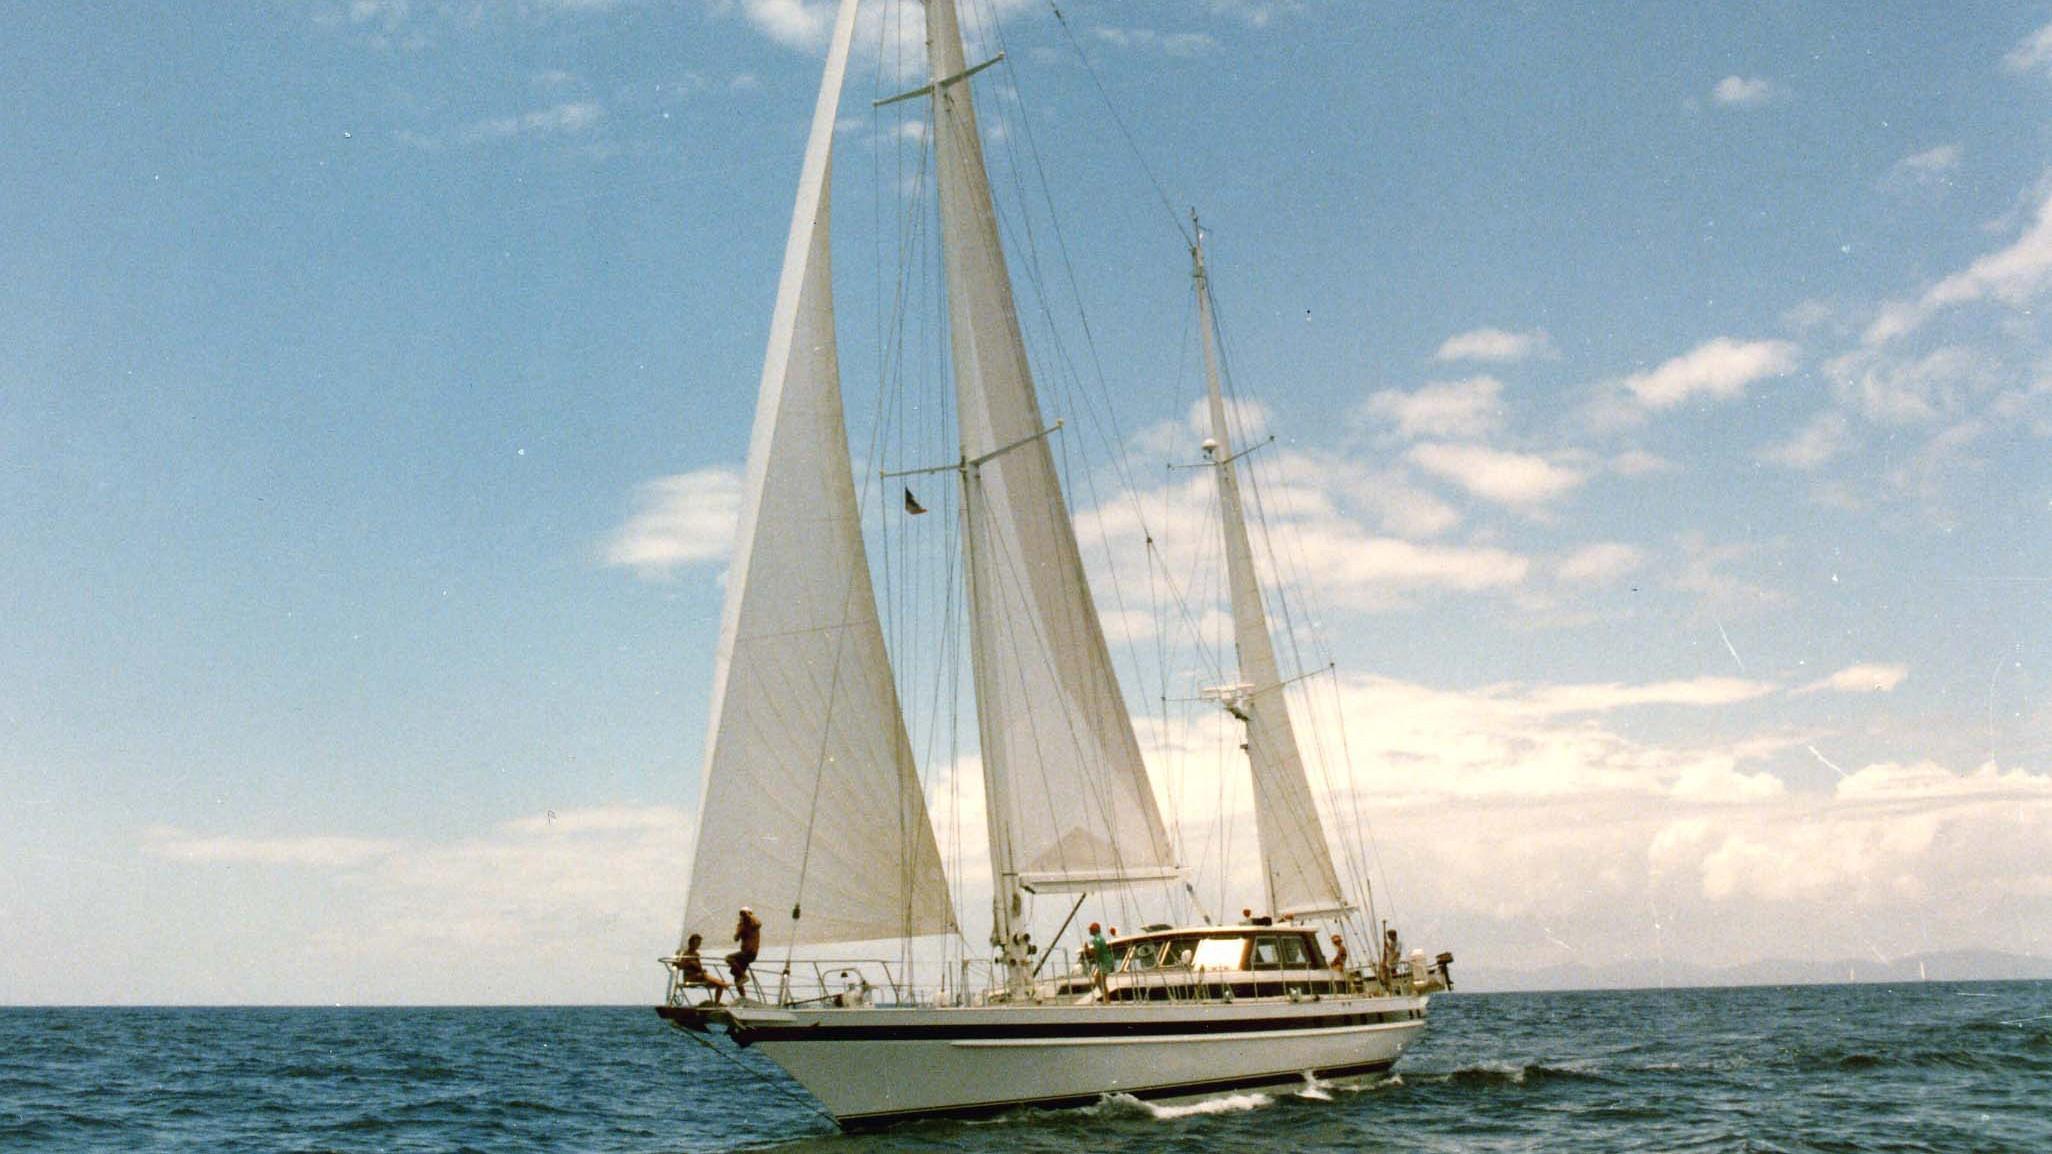 aneta jade s sailing yacht jongert 29m 1985 half profile